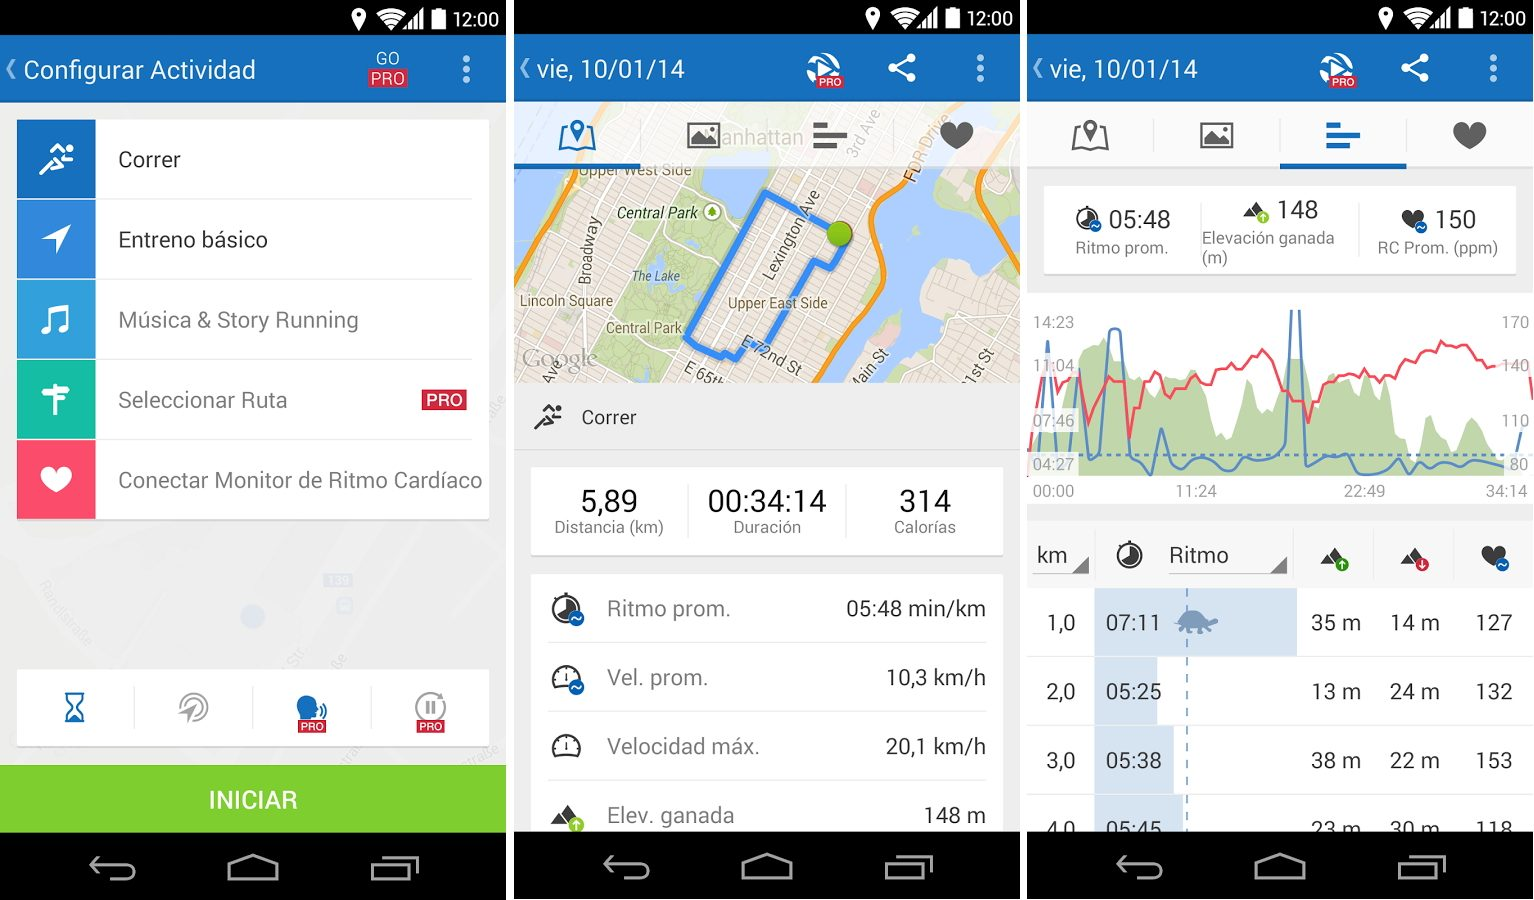 App para correr Android Runtastic